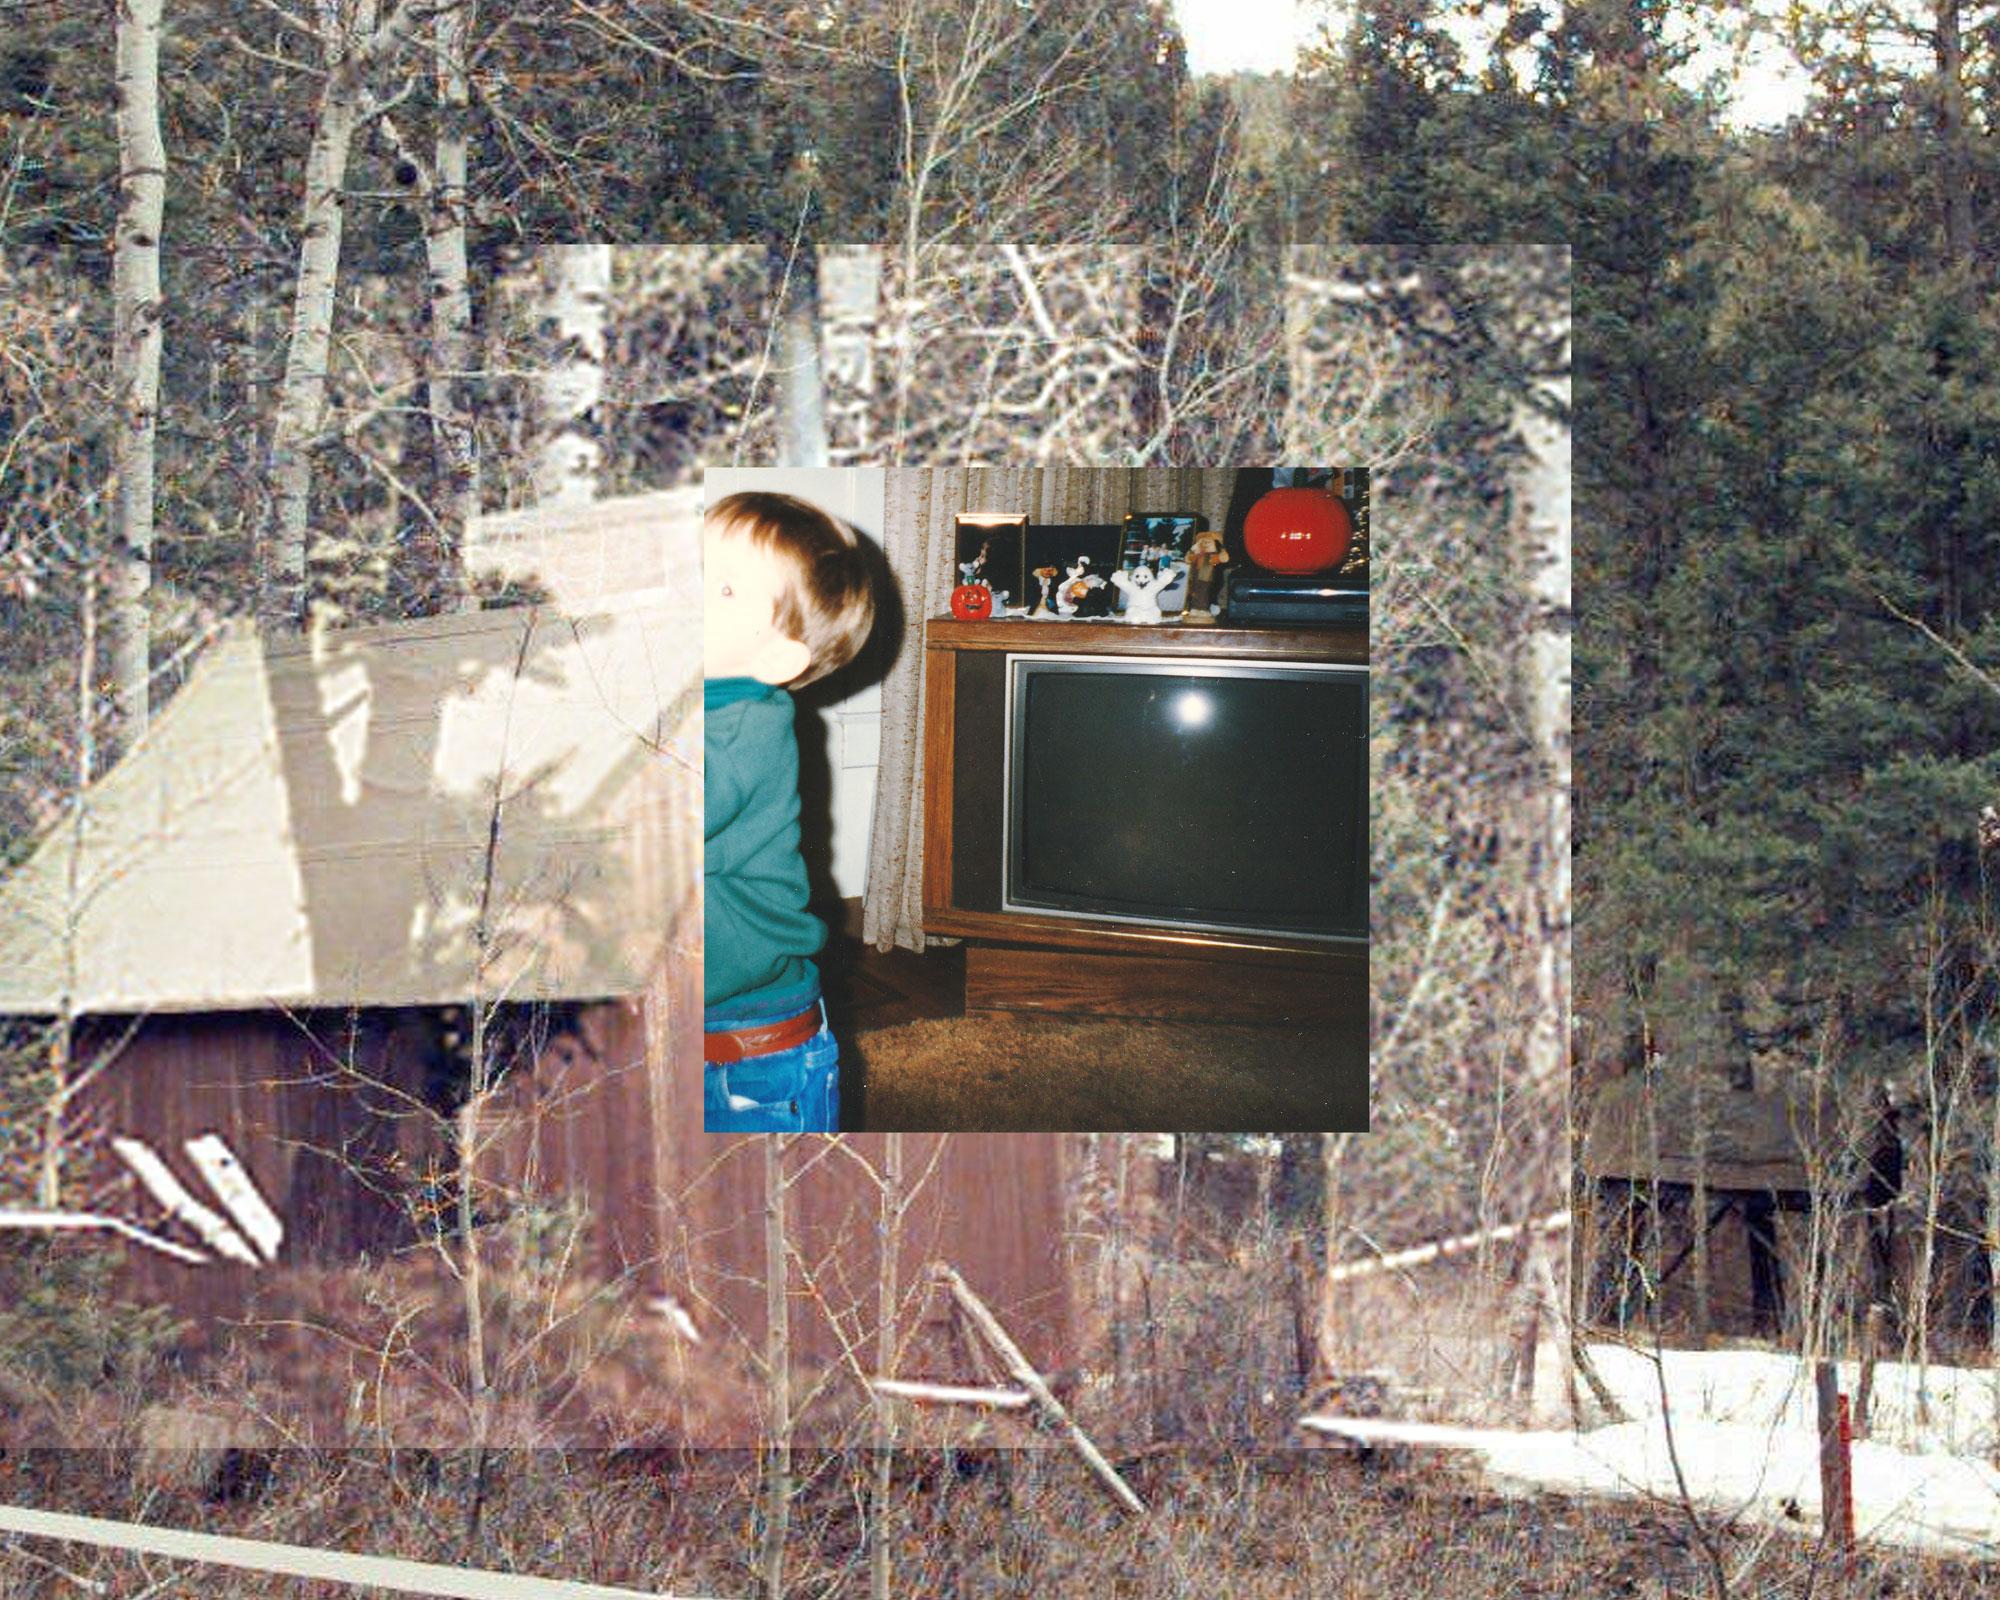 1996 (2 Layers of Ted Kaczynski's cabin)